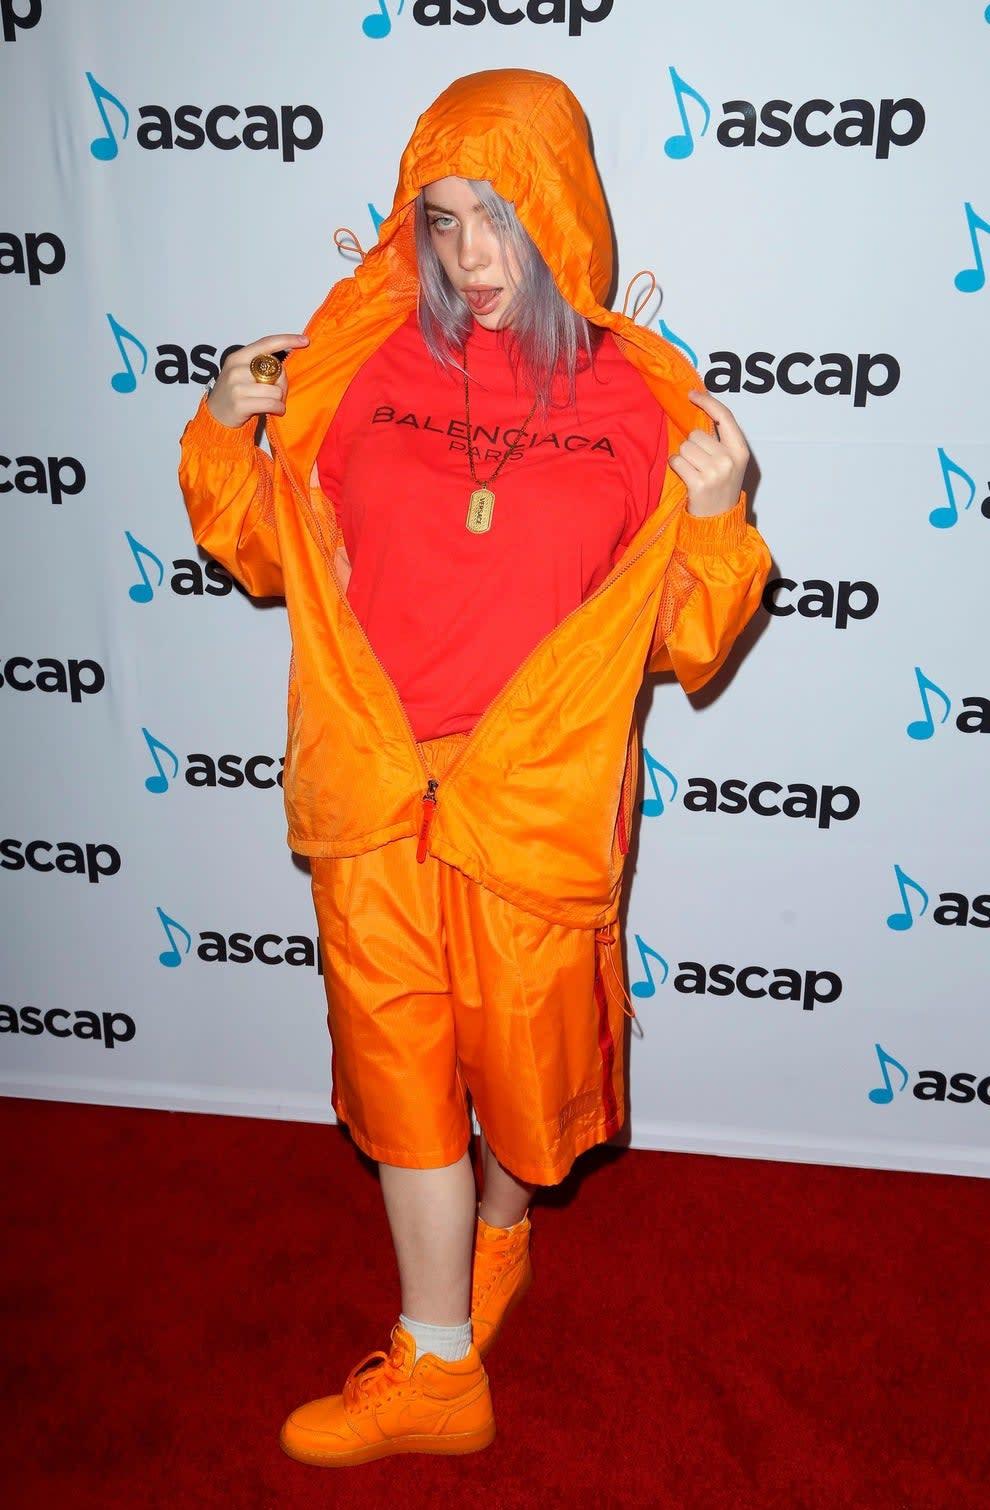 Billie no tapete com conjunto laranja Balenciaga